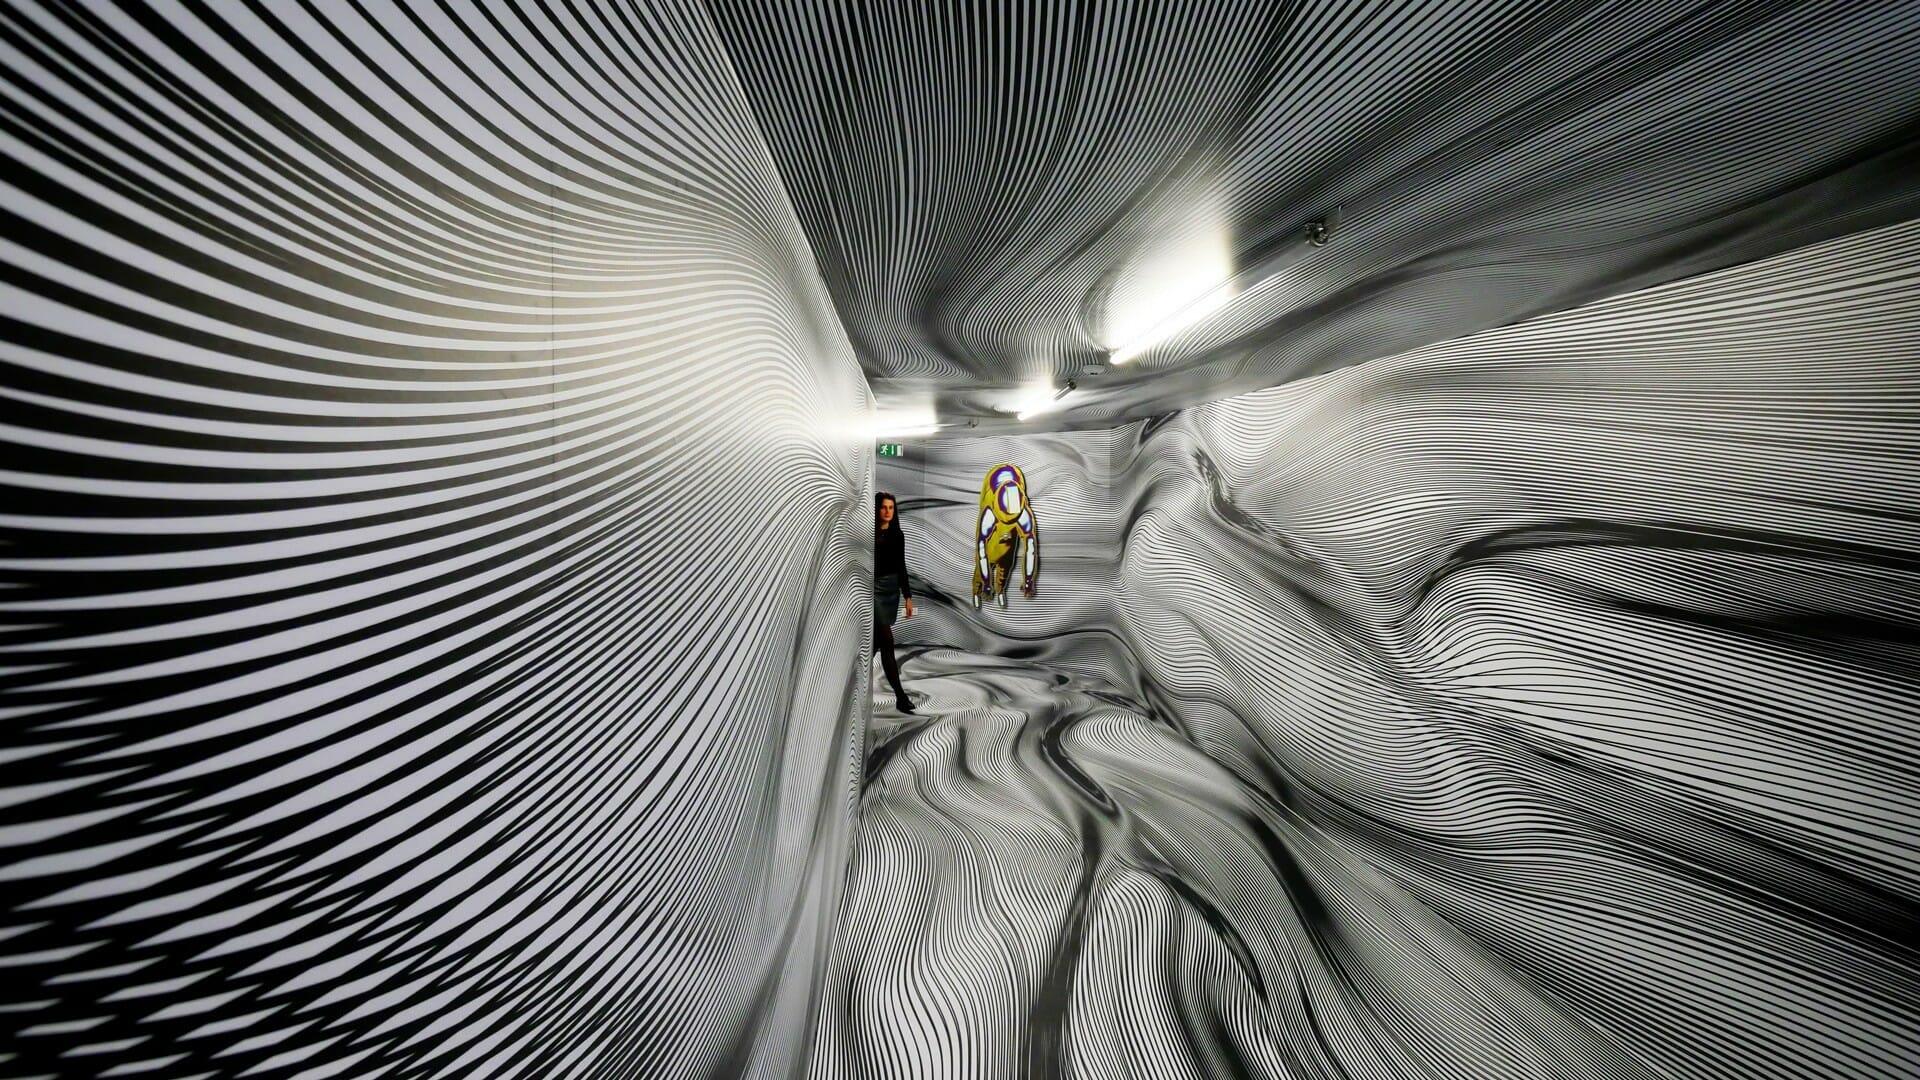 Les couloirs ondoyants de Peter Kogler 1